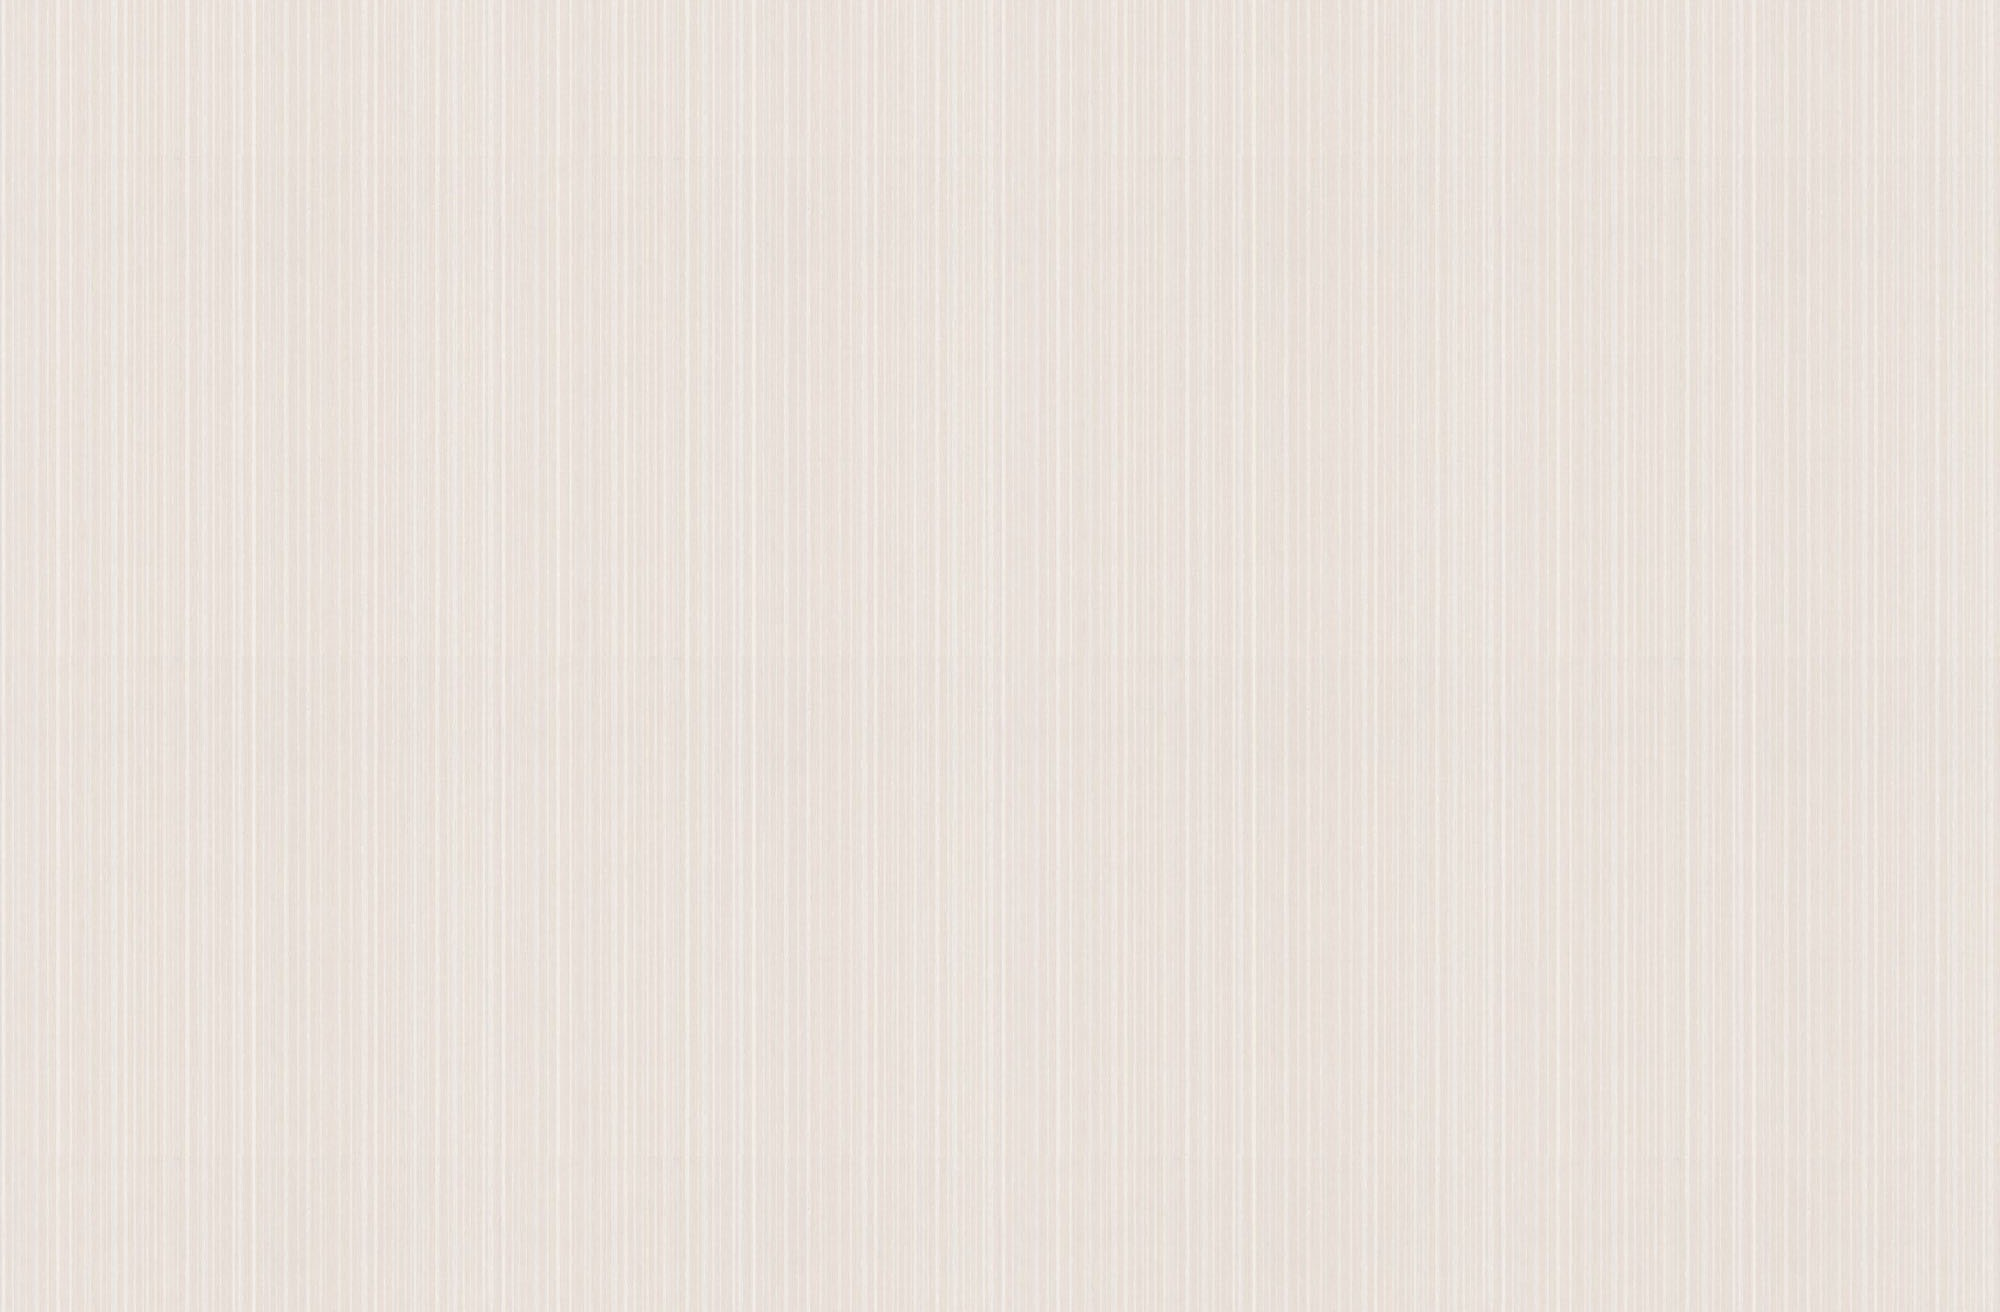 cream wallpaper 2000x1312